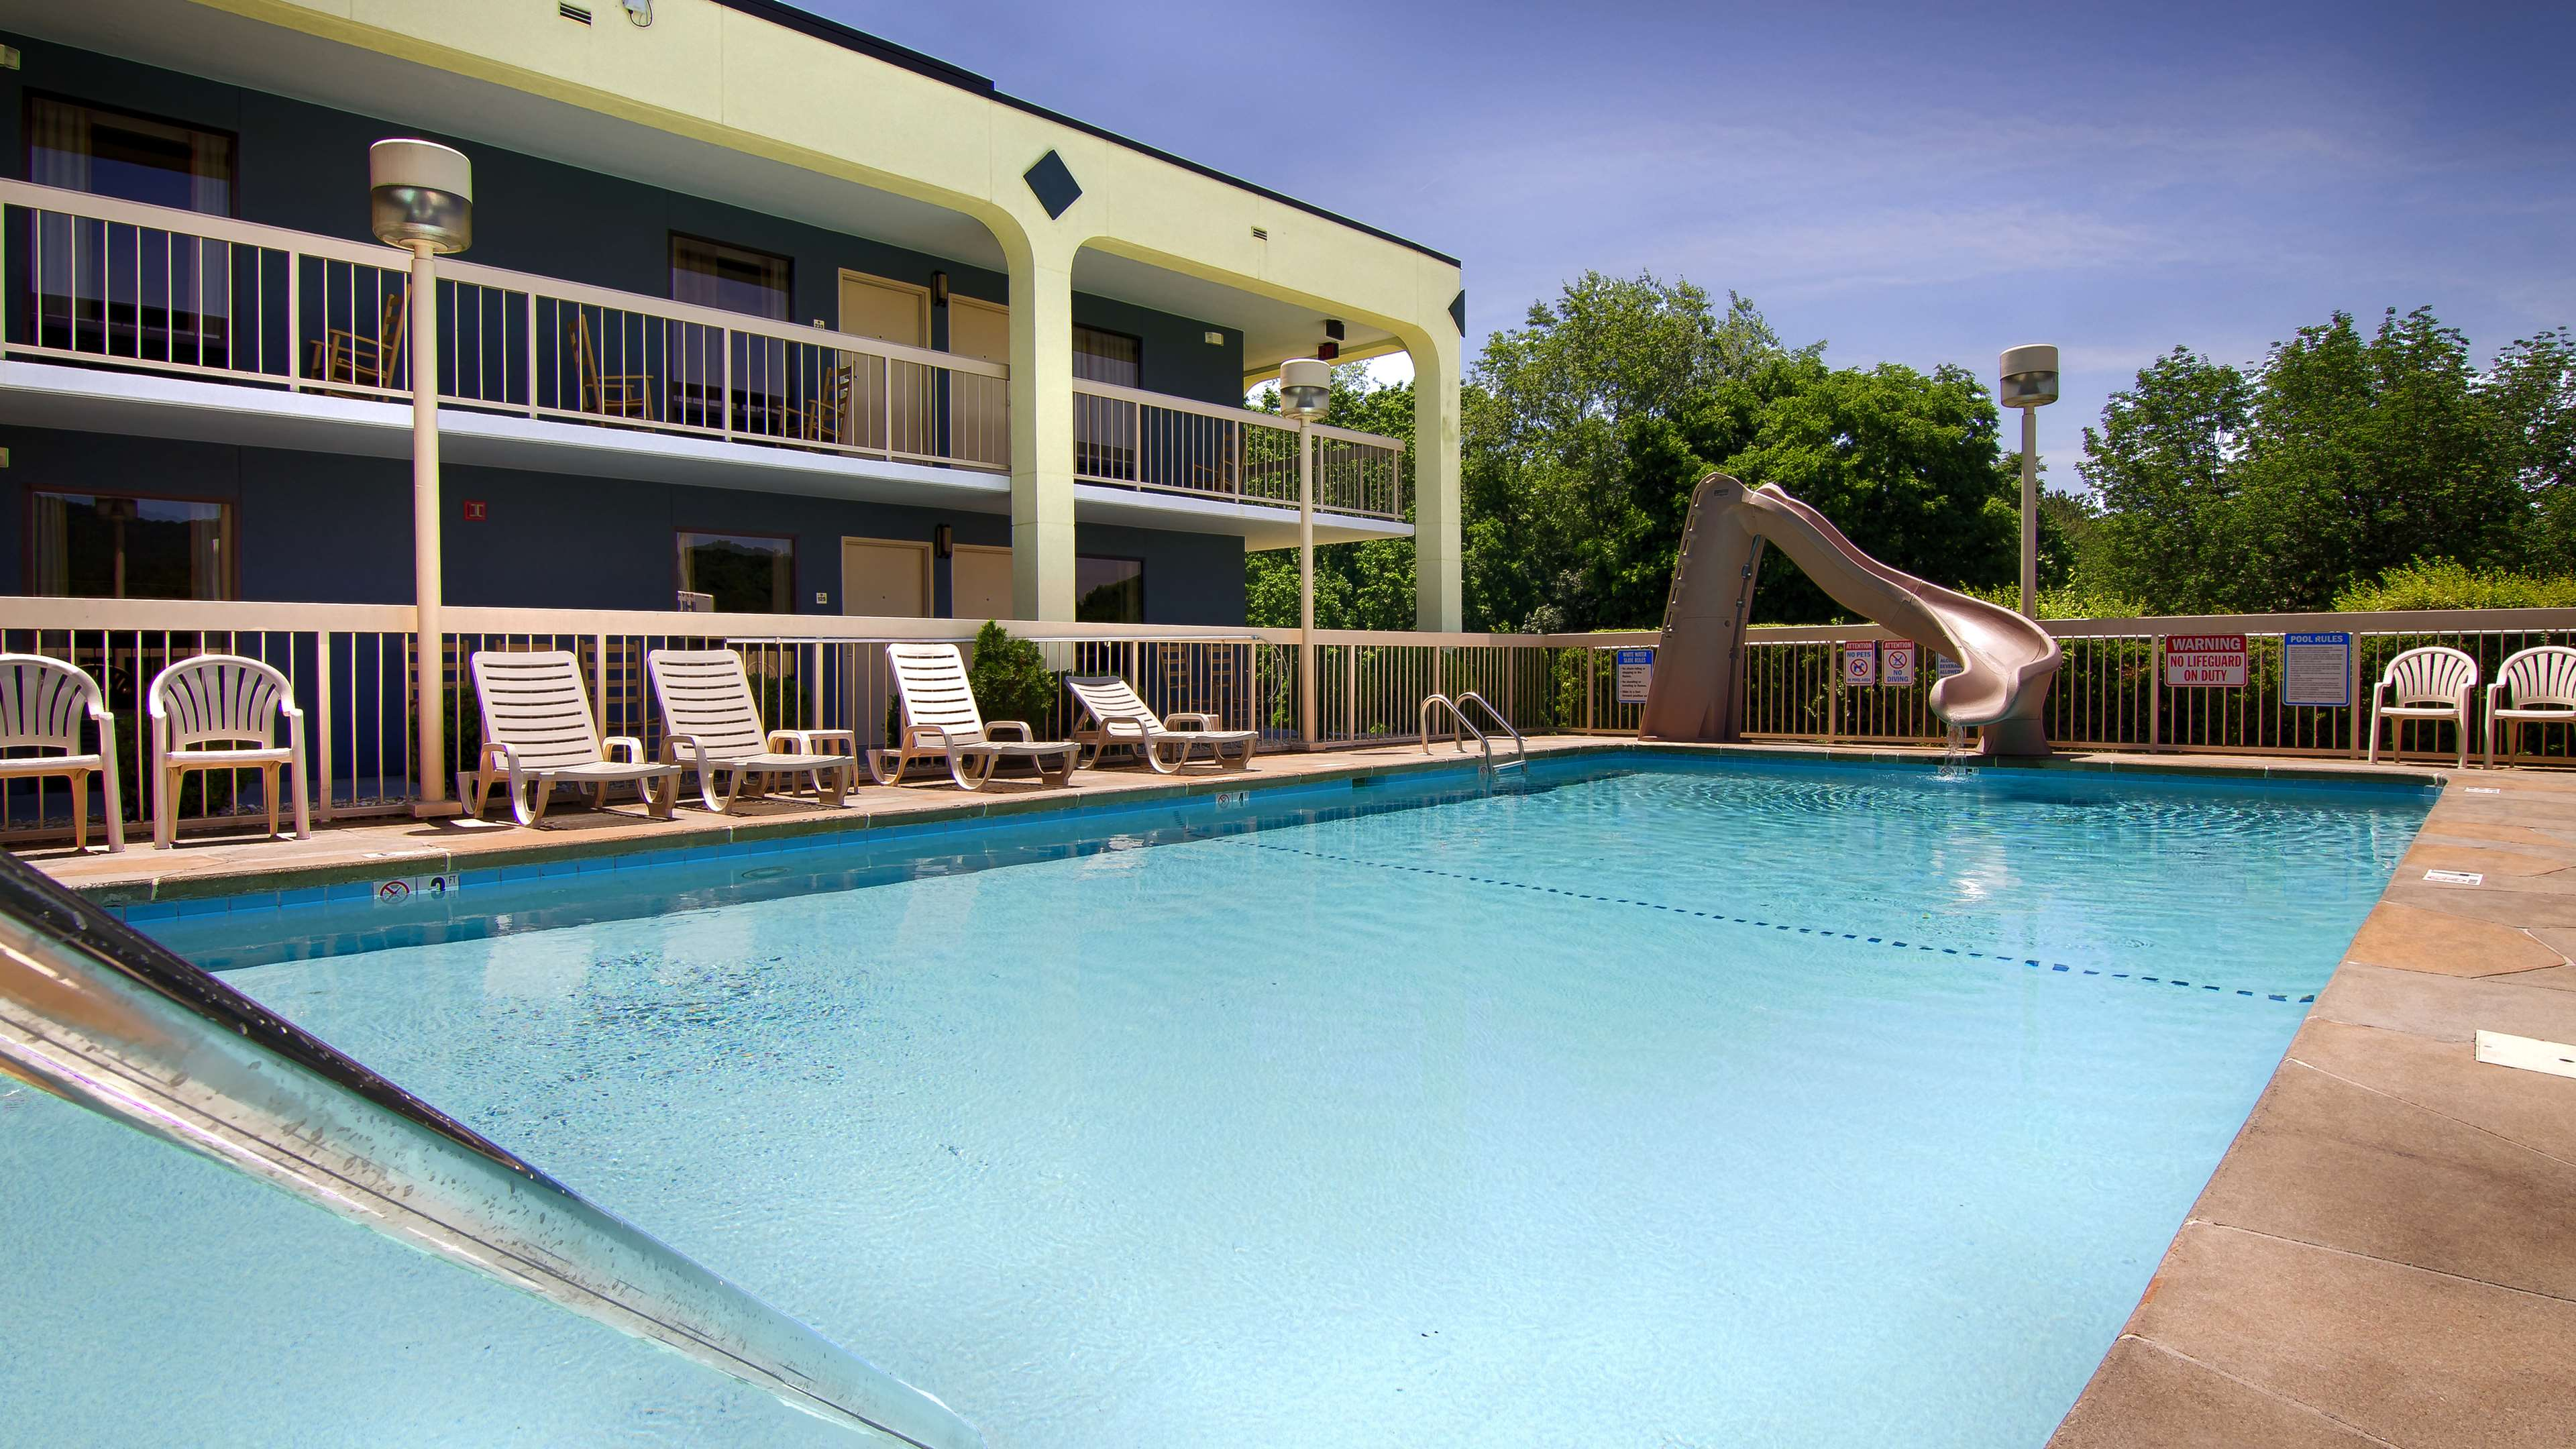 Best Western Cades Cove Inn image 12